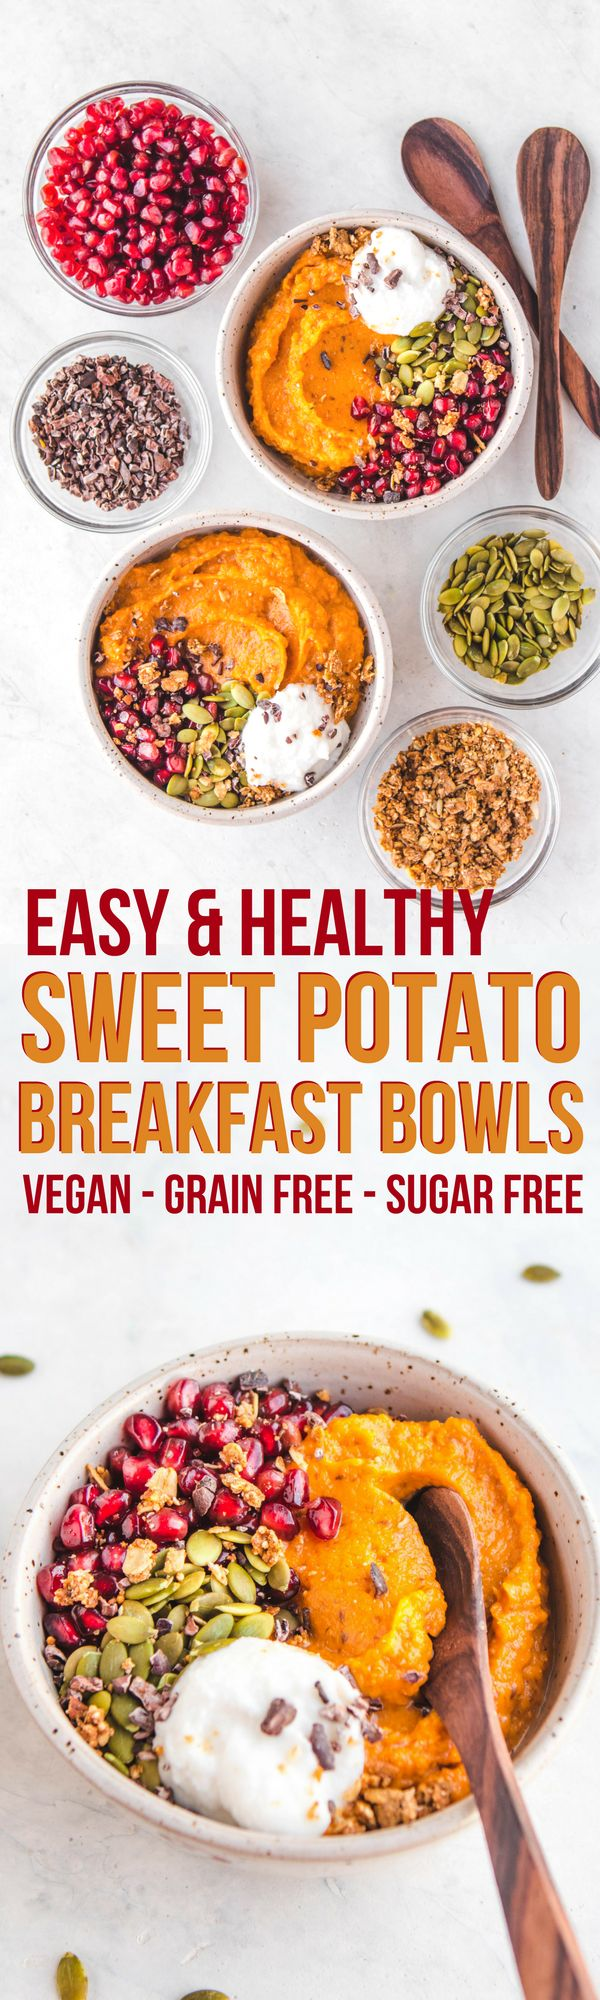 Fluffy Sweet Potato Breakfast Bowls - Vegan & Grain Free - From My Bowl